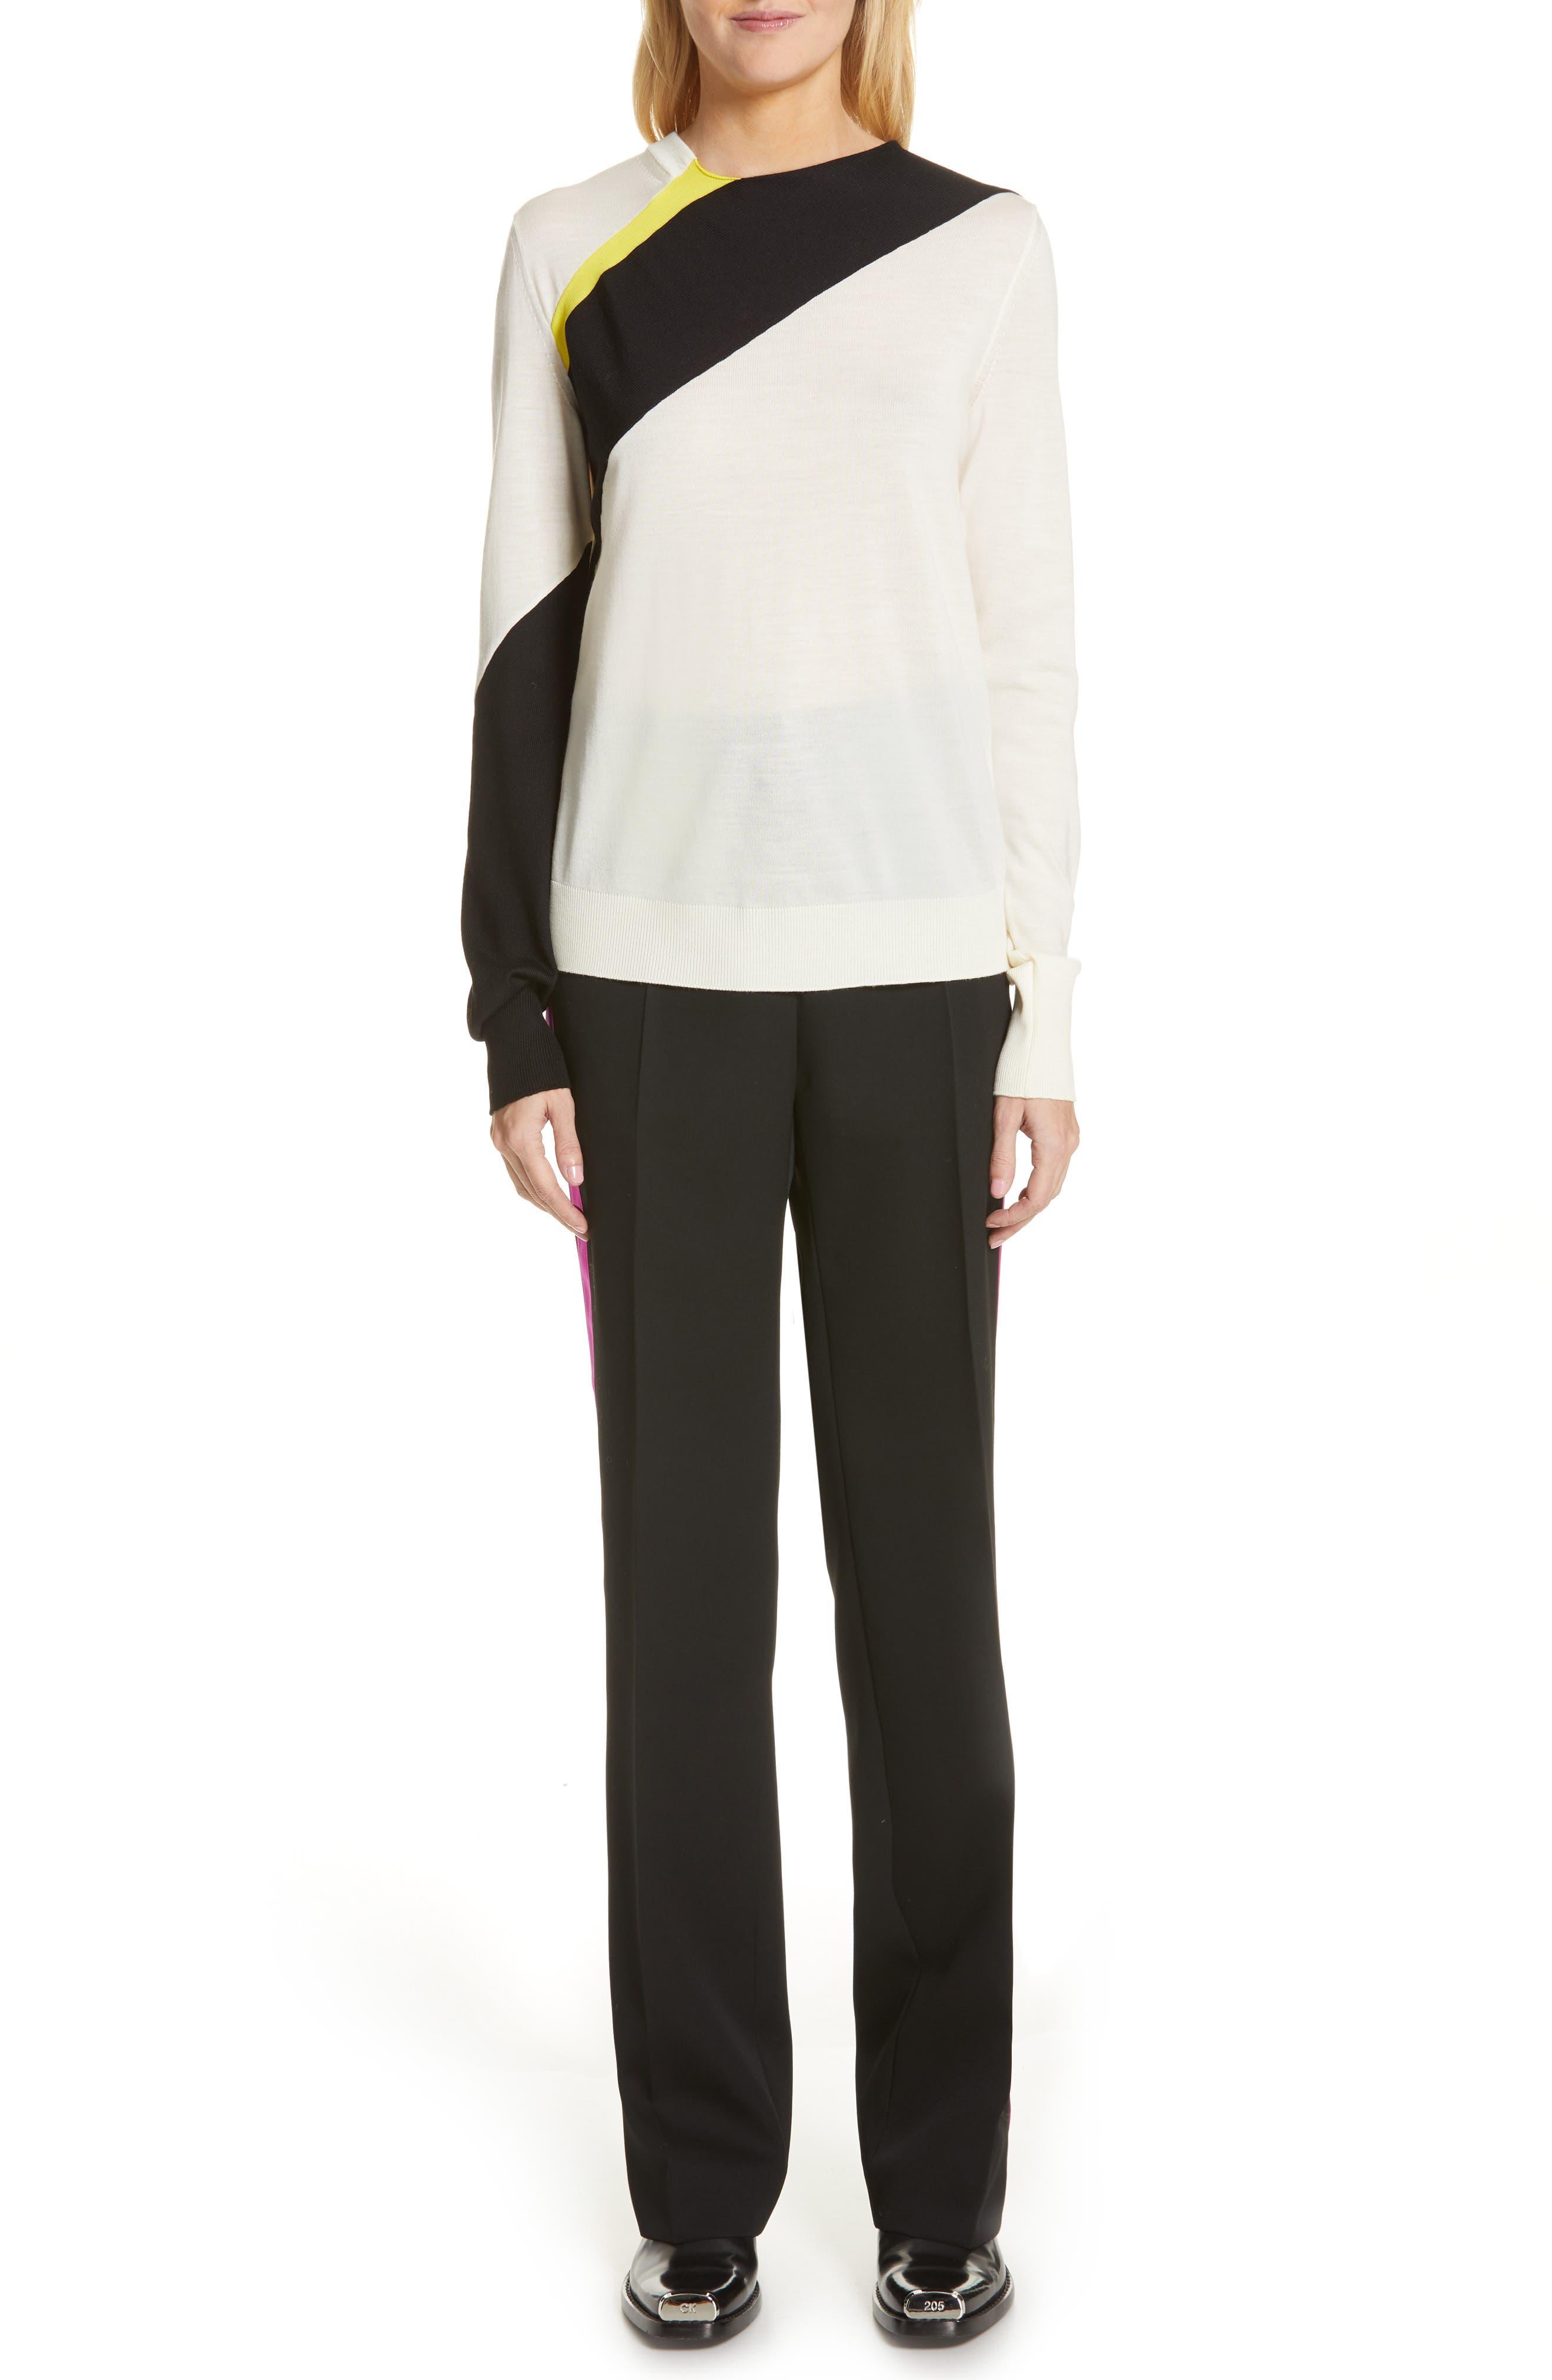 CALVIN KLEIN 205W39NYC, Contrast Stripe Wool Blend Sweater, Alternate thumbnail 8, color, WHITE BLACK TOURNESOL